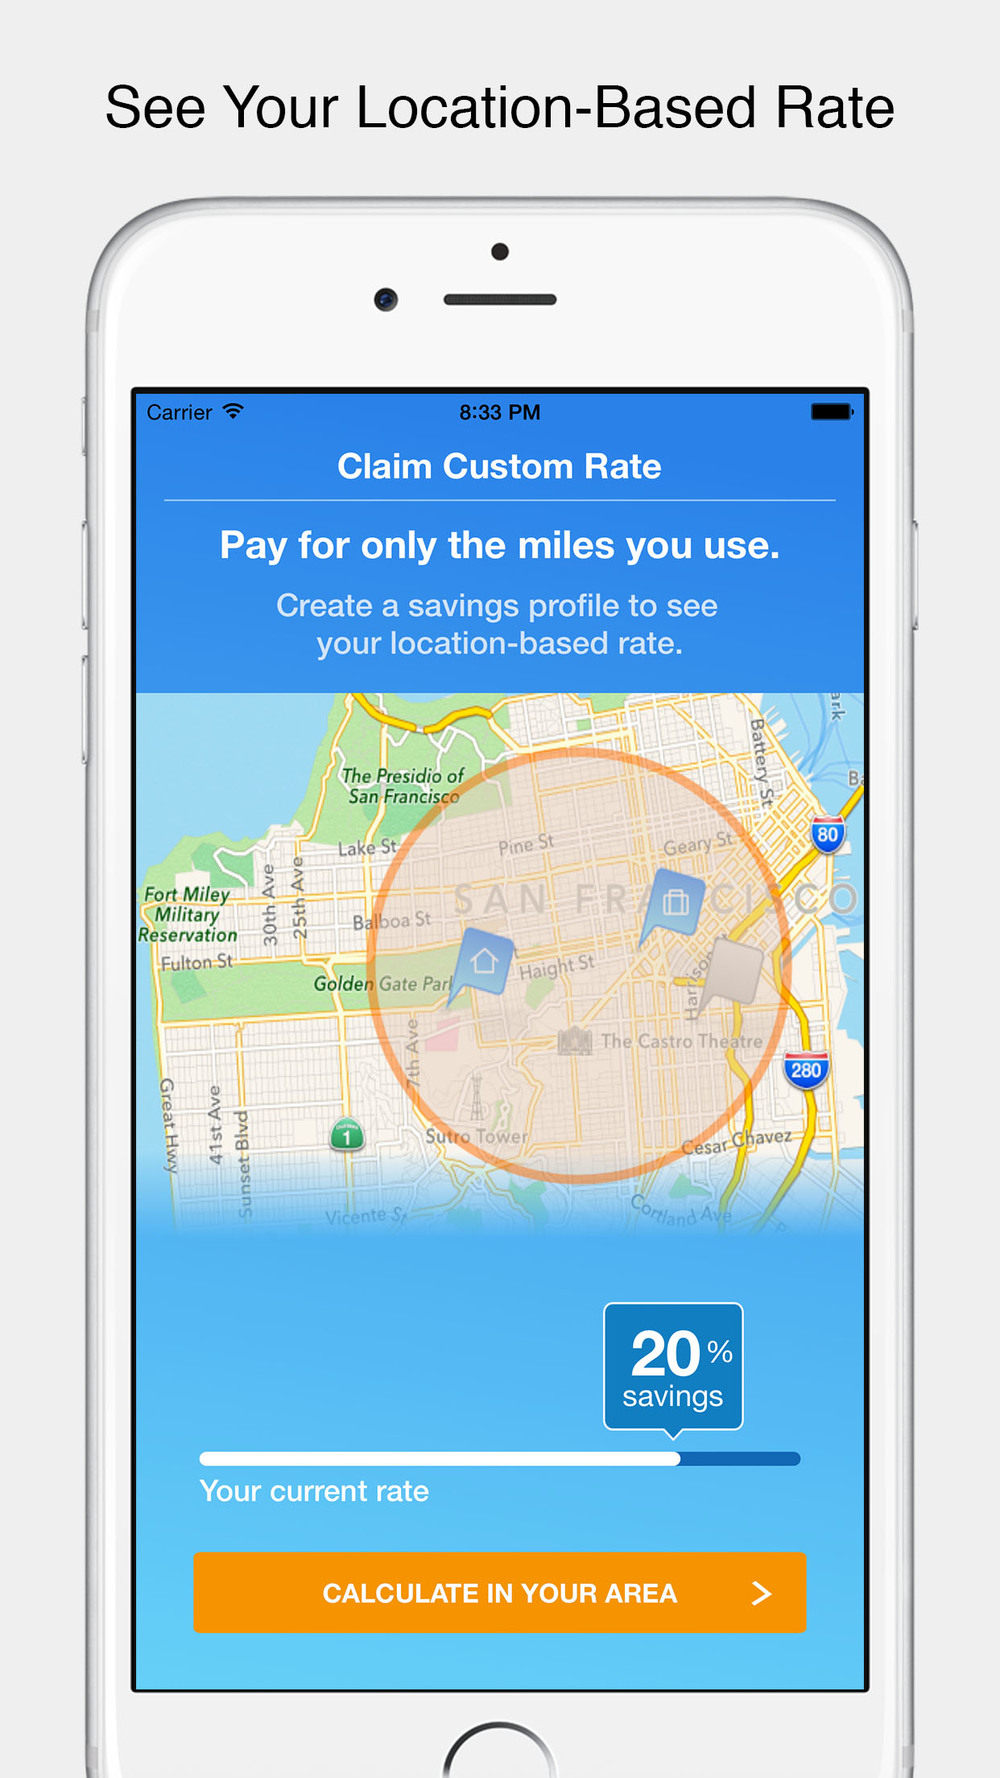 Go-Location-Based-Savings